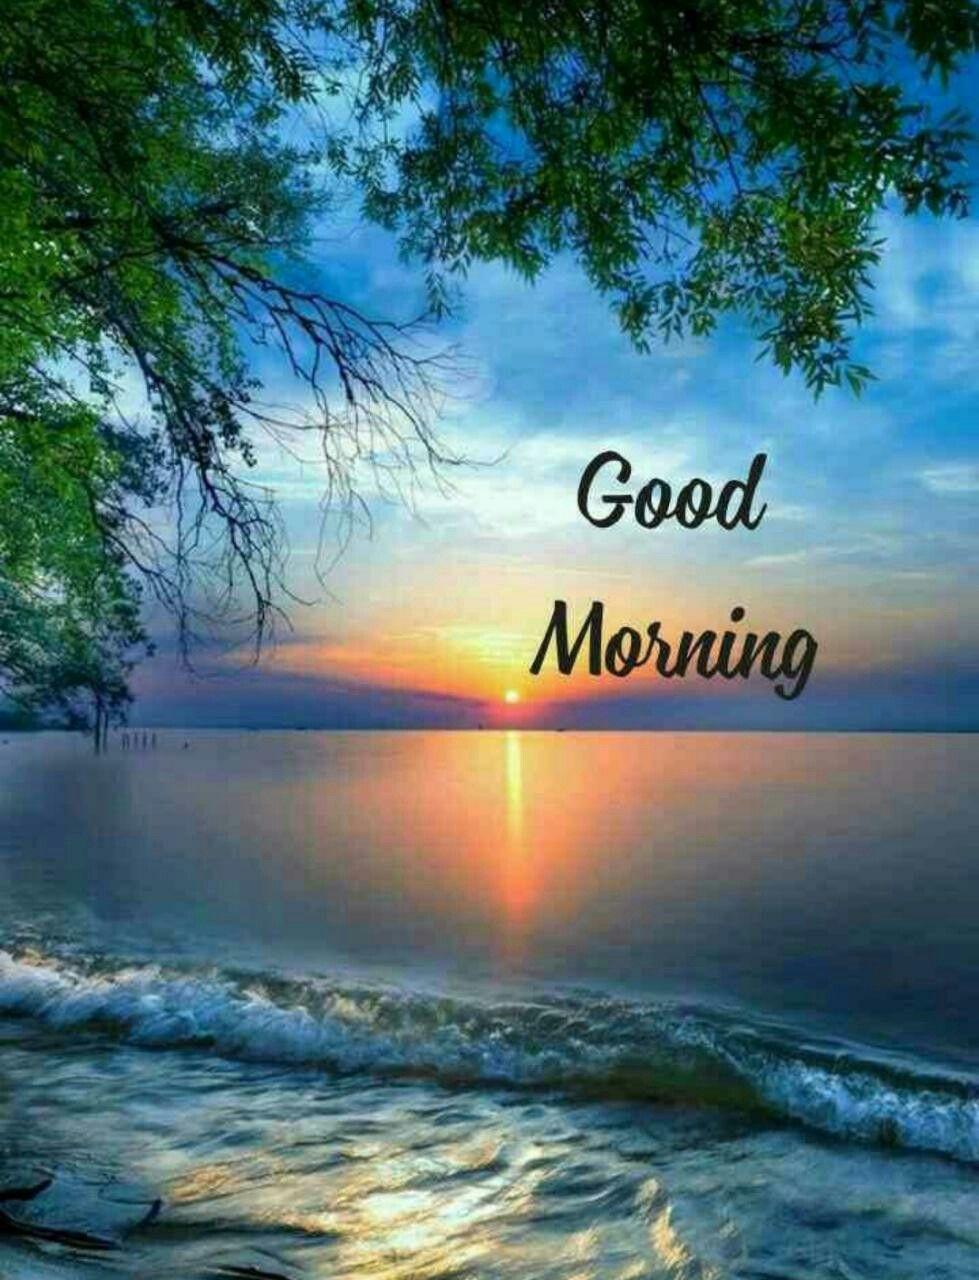 Good Morning Sweetheart In 2020 Good Morning Beautiful Pictures Good Morning Nature Good Morning Picture